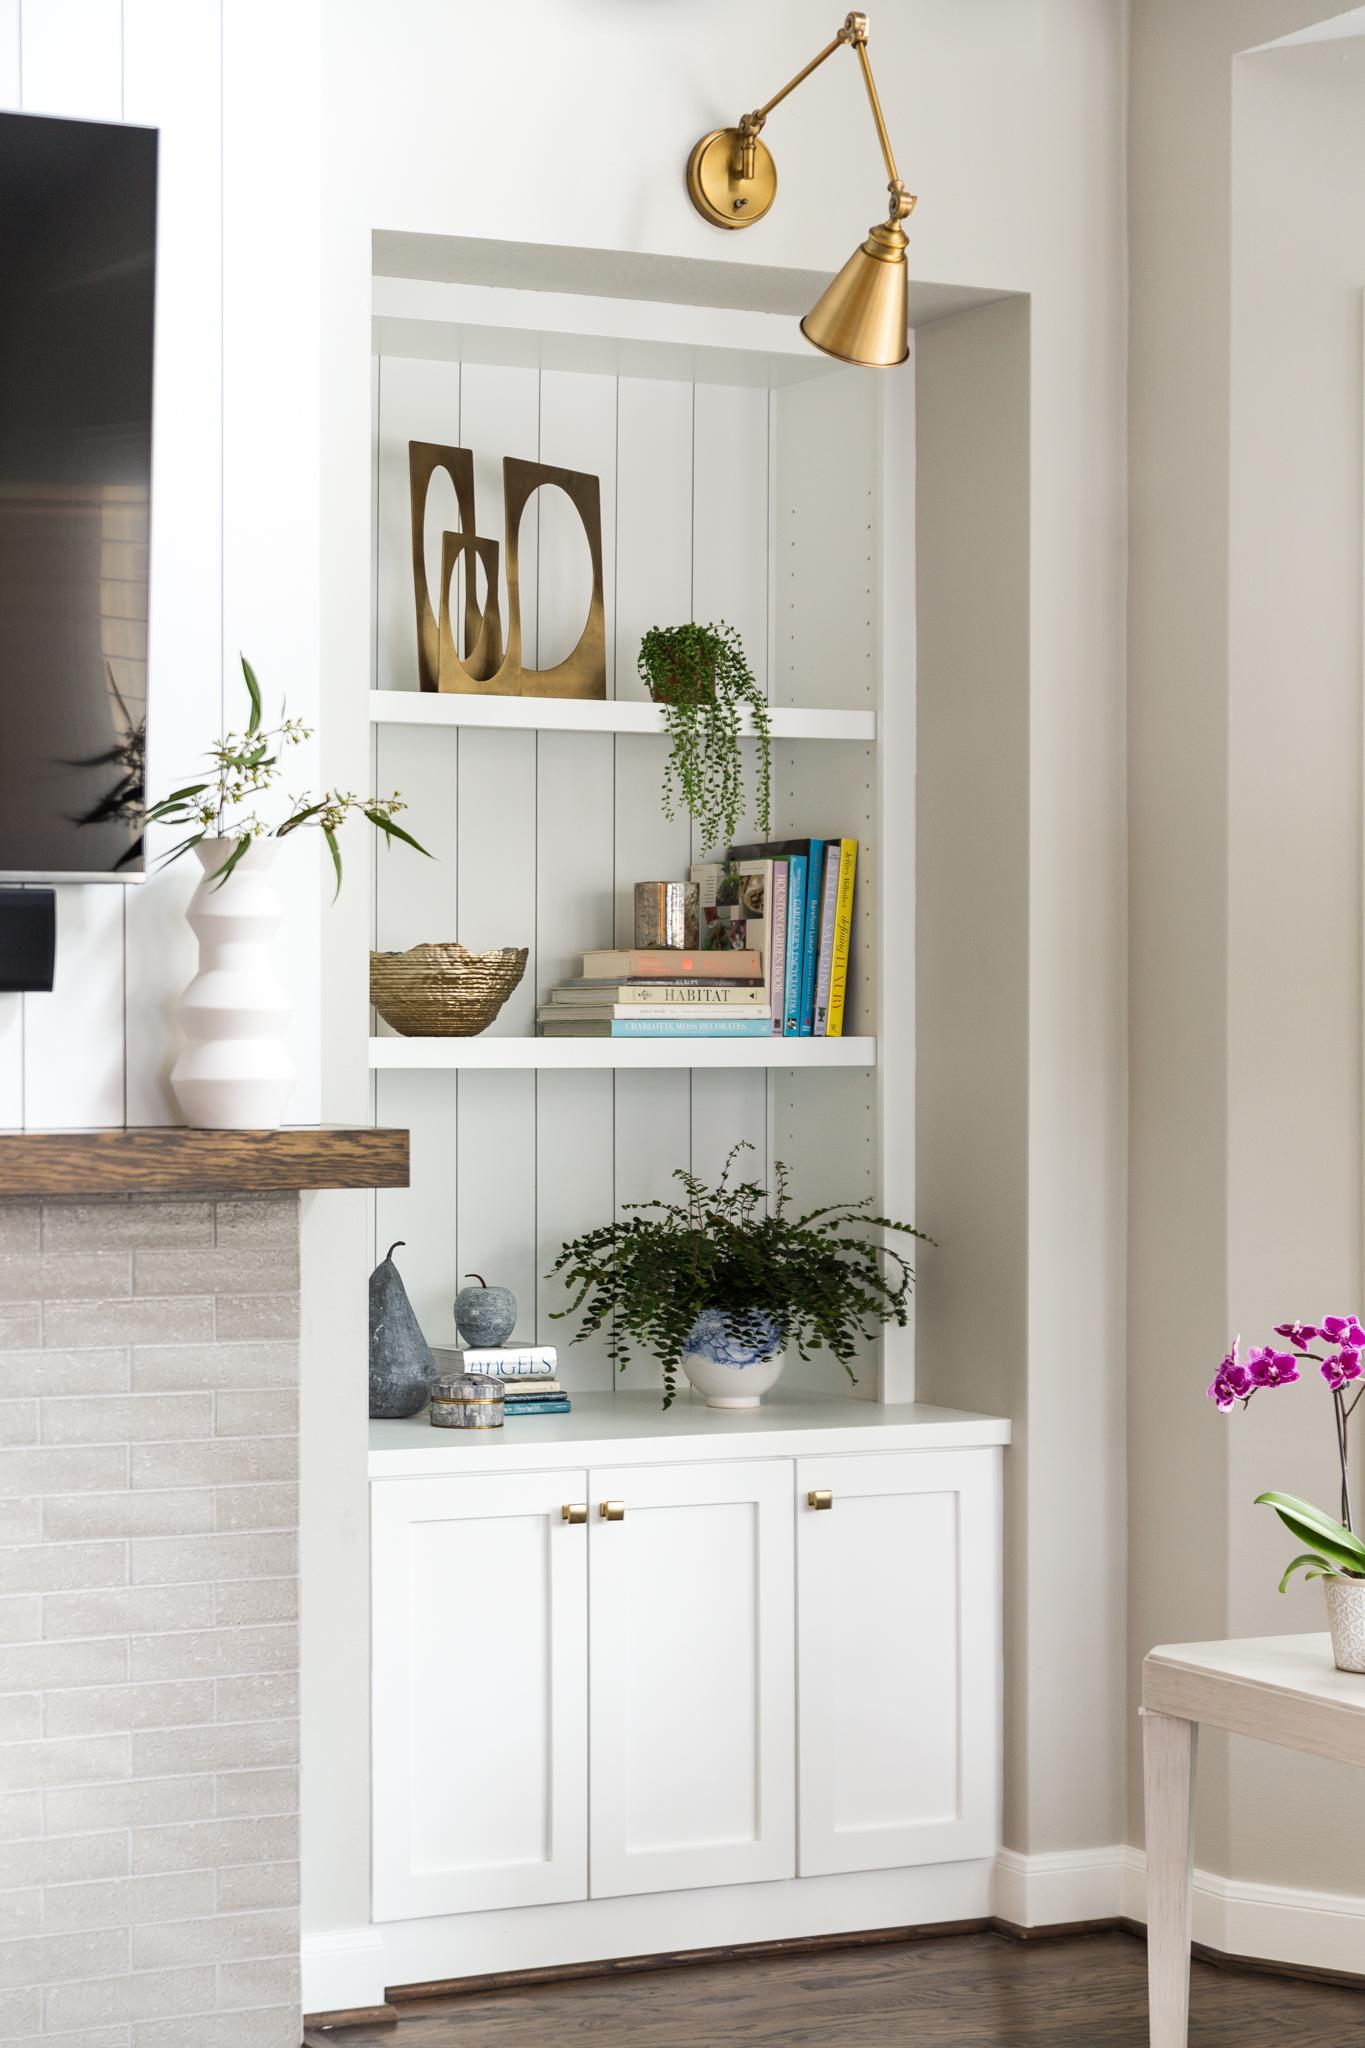 BEFORE AND AFTER - A Fresh, Light Family-Friendly Home Makeover | Carla Aston, Designer | Colleen Scott, Photographer #livingroom #livingroomideas #bookshelfstyling